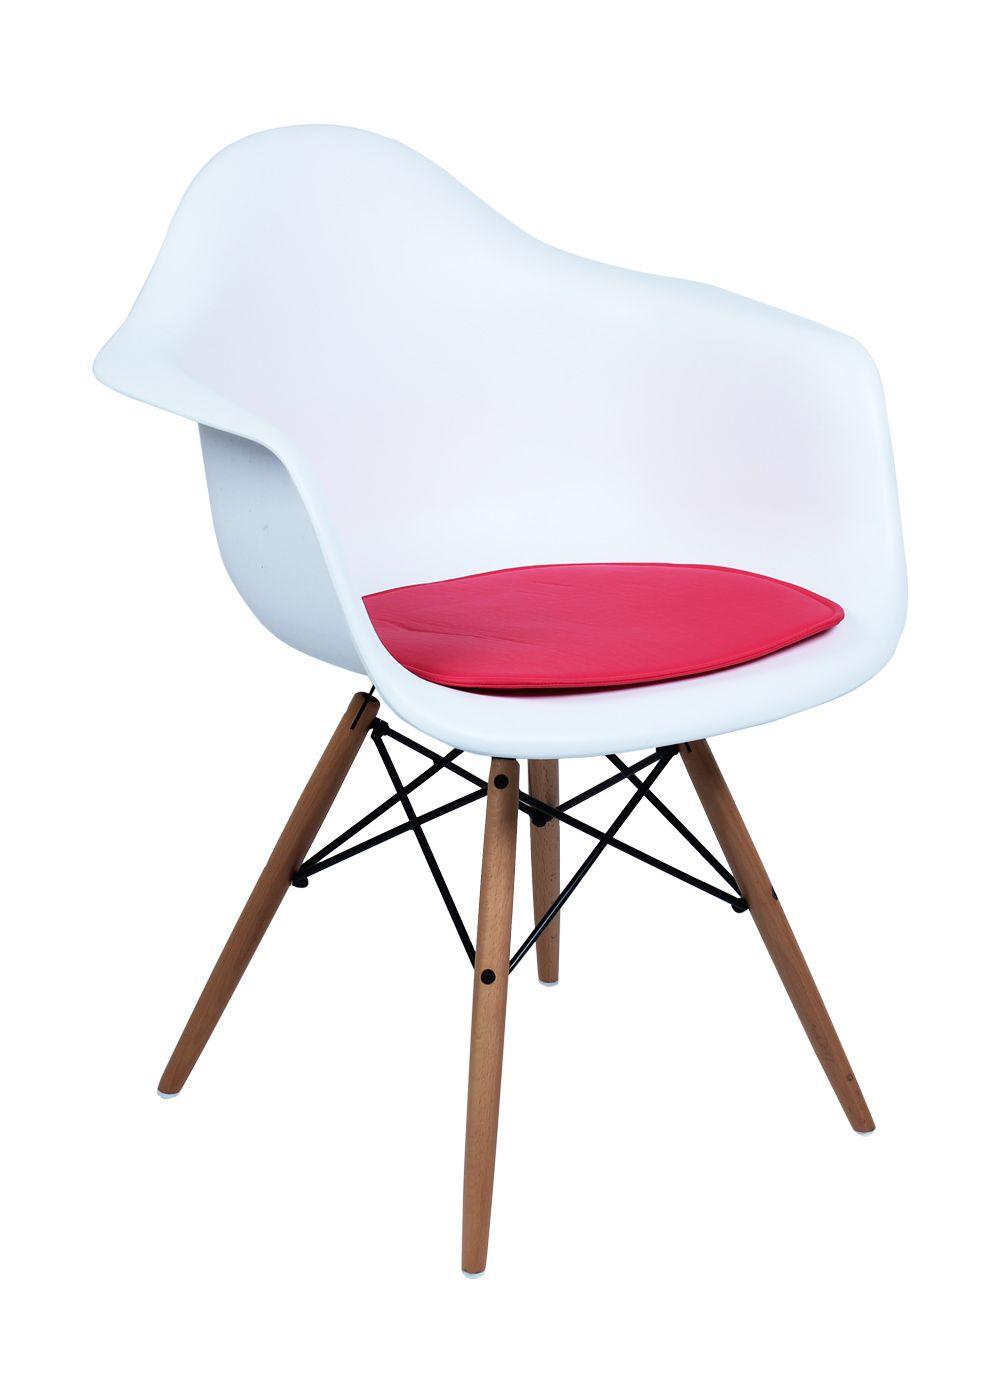 Coussins Pour Chaises DAW Charles Eames